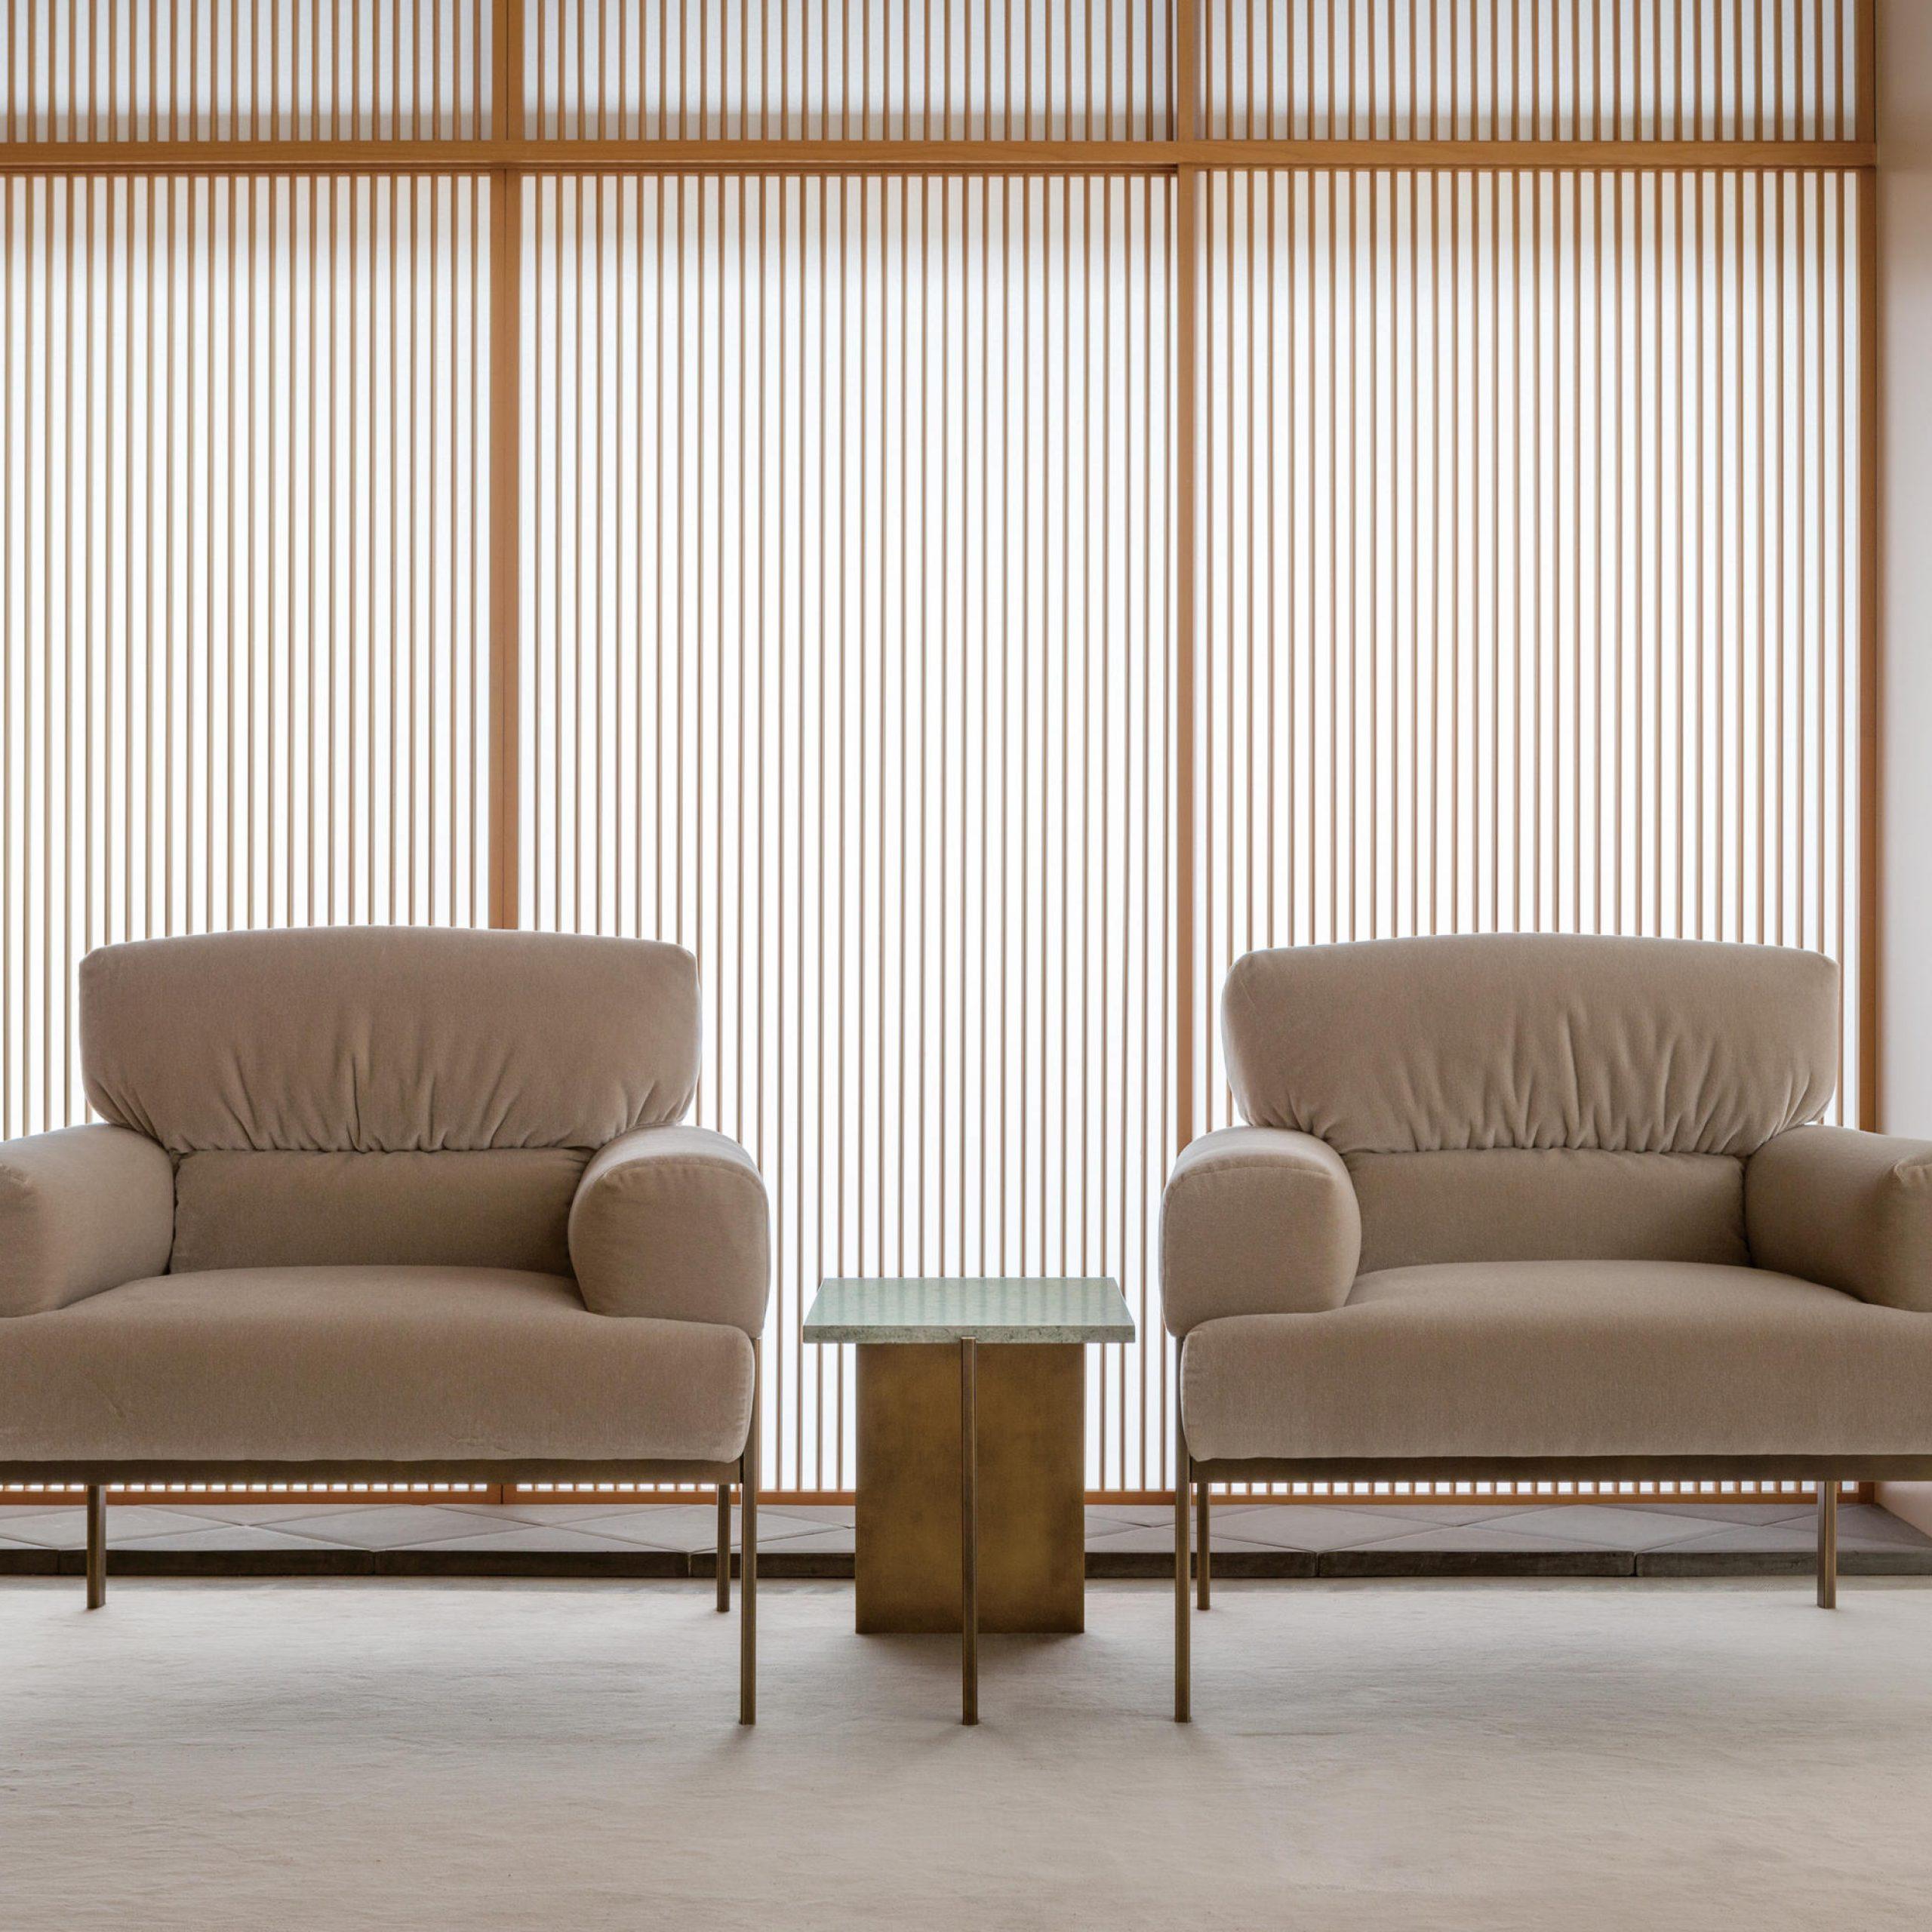 Suki | Armchair & Designer Furniture | Architonic With Regard To Suki Armchairs (View 9 of 15)